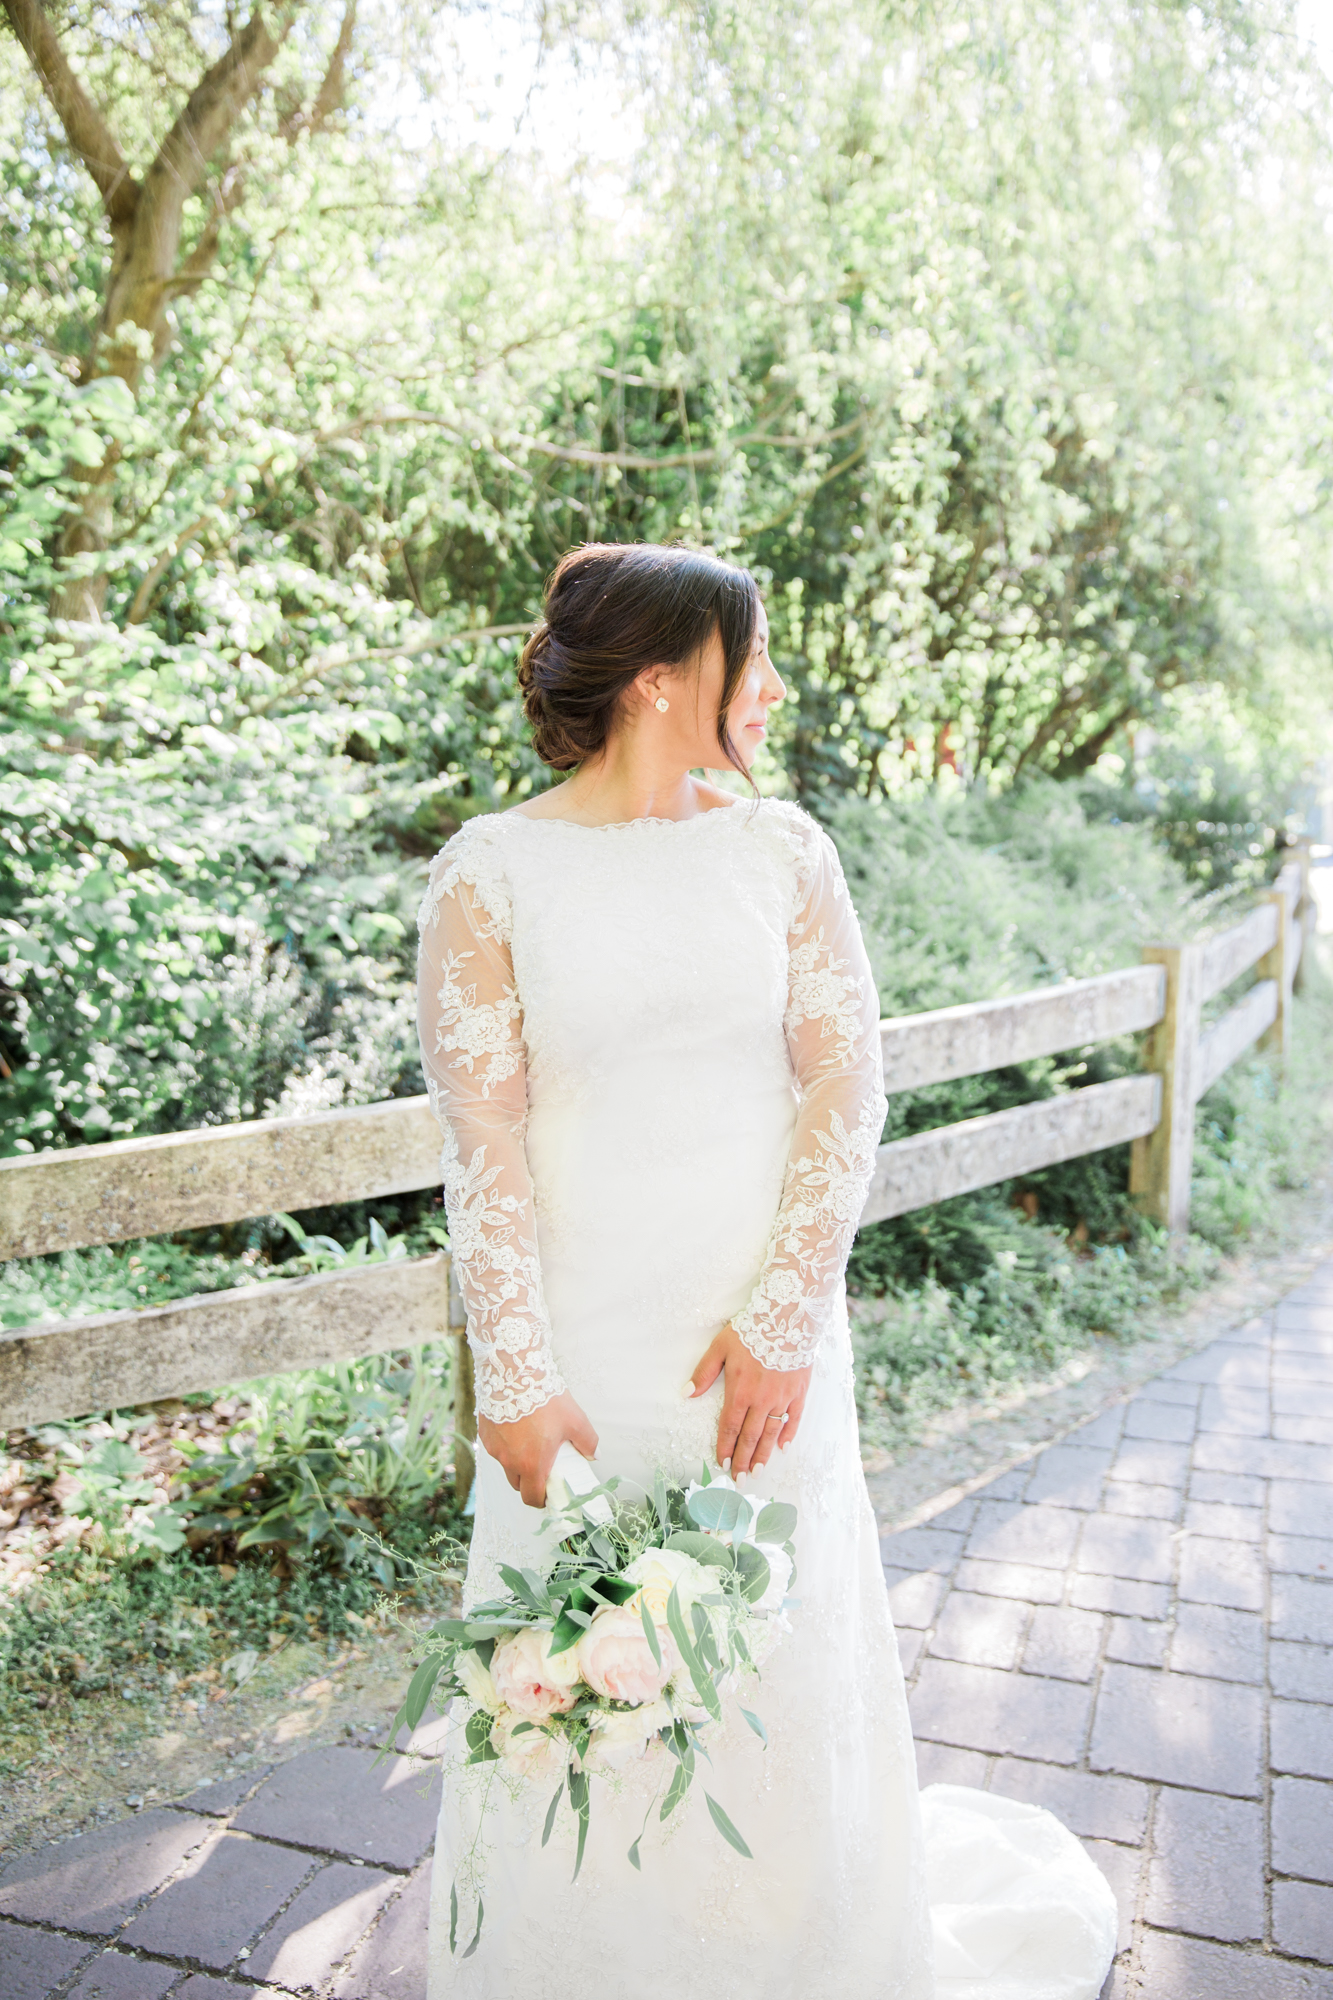 Eden&MePhoto|Bridals|Lexi&Jacob